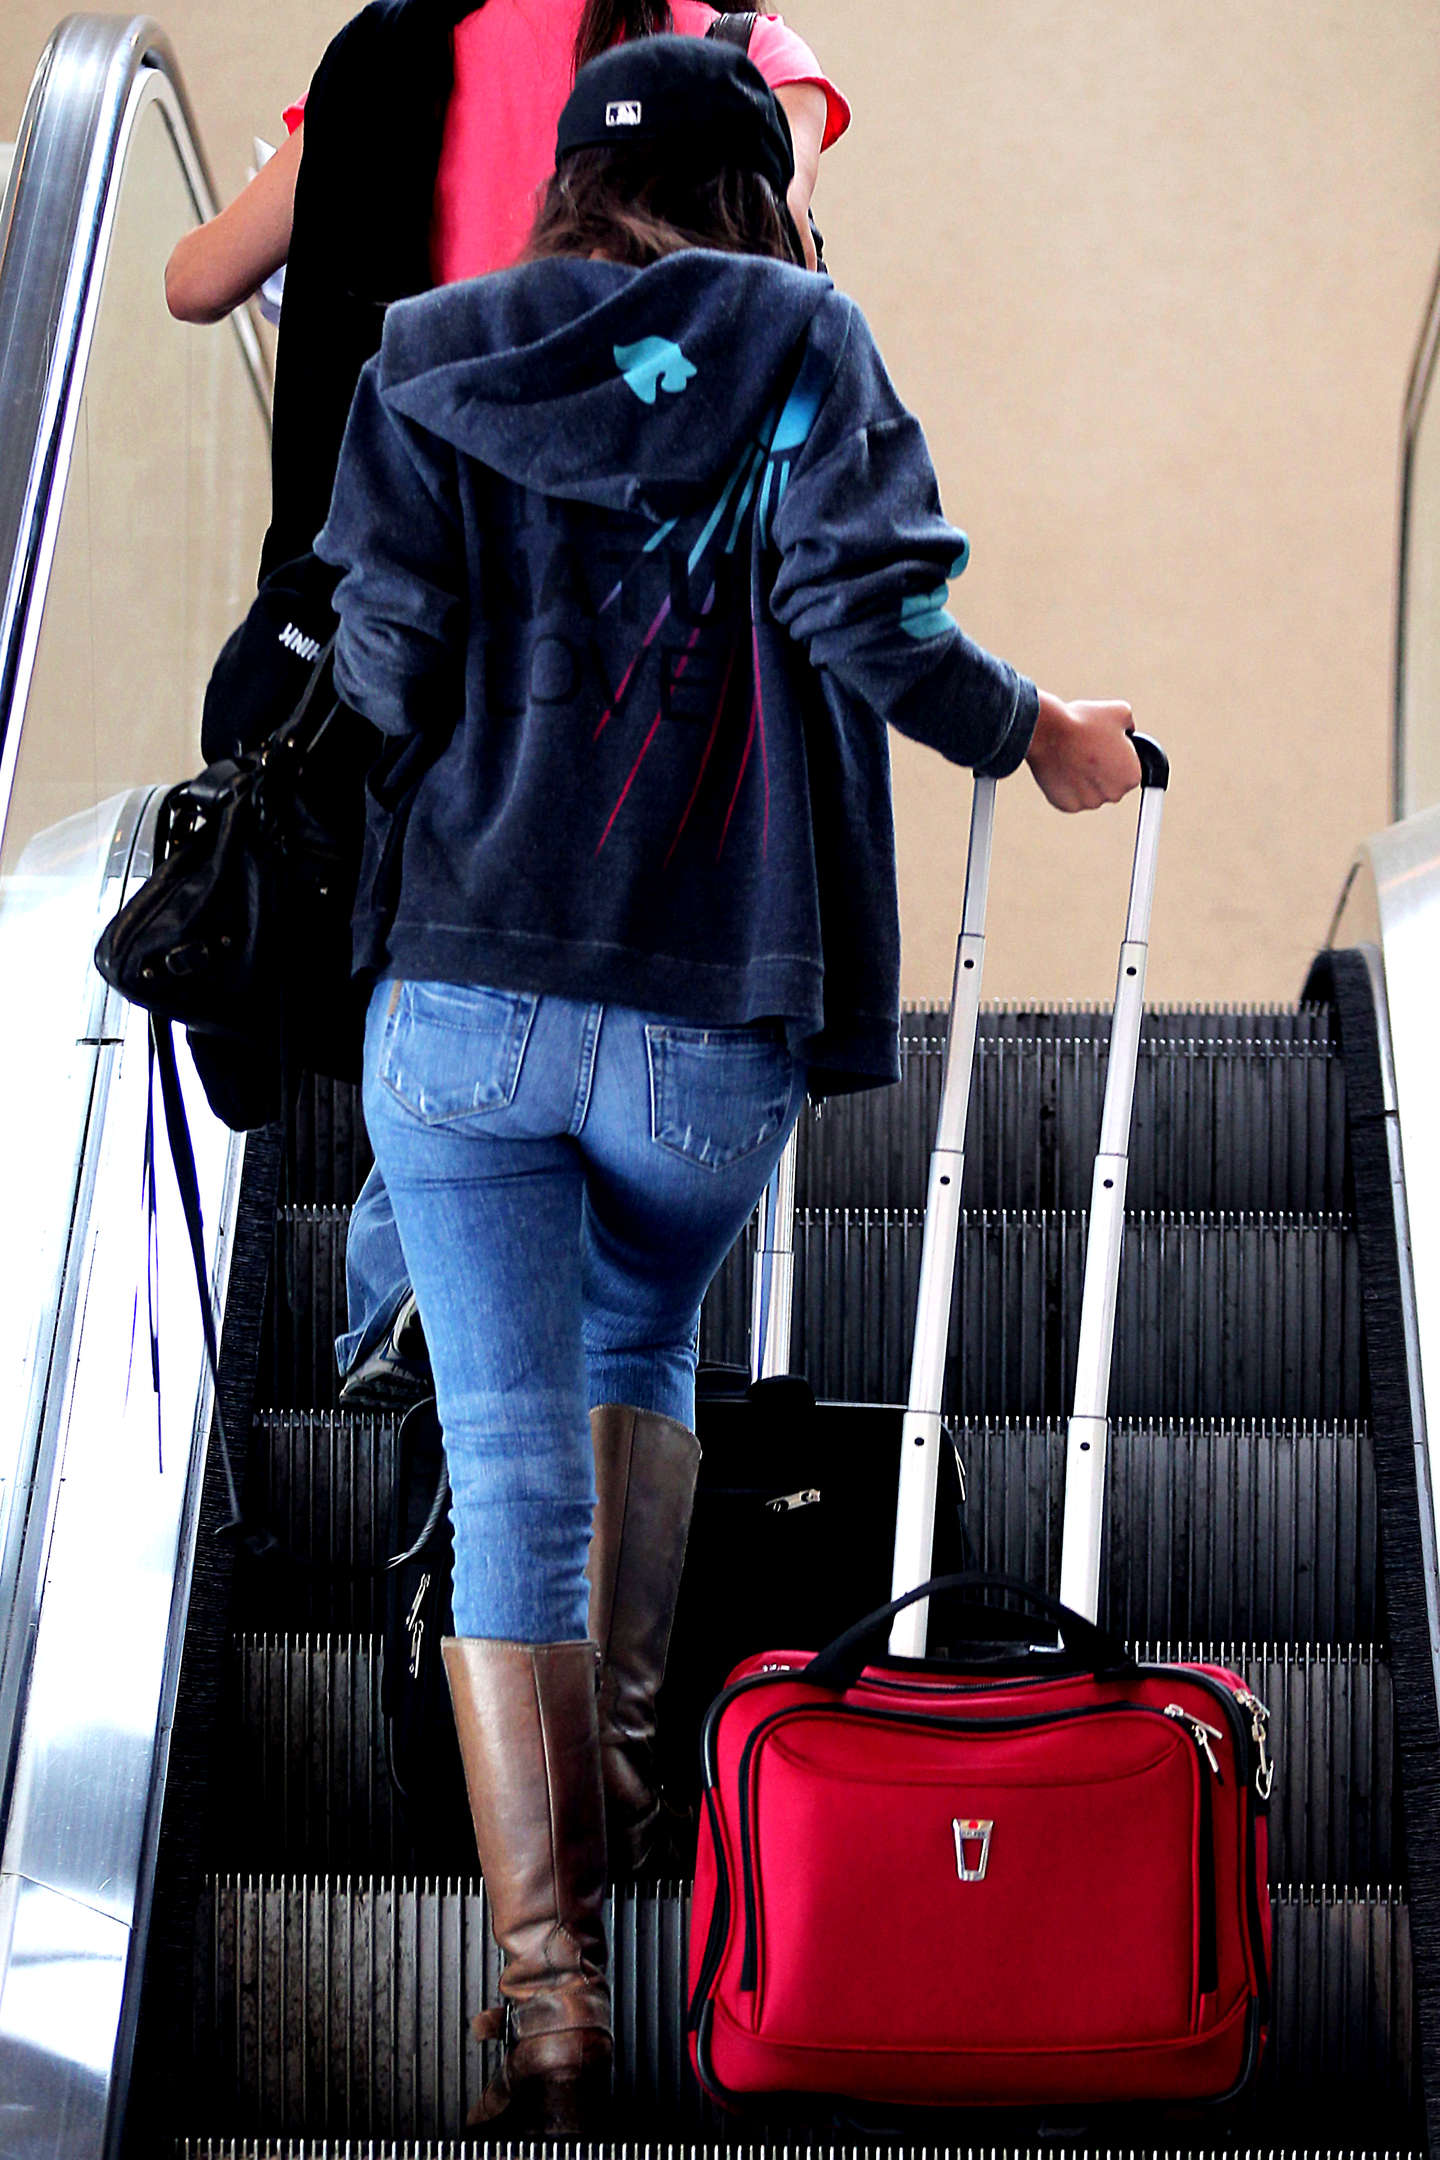 Kim Kardashian Ass In Tight Jeans Victoria Justice In Ti...